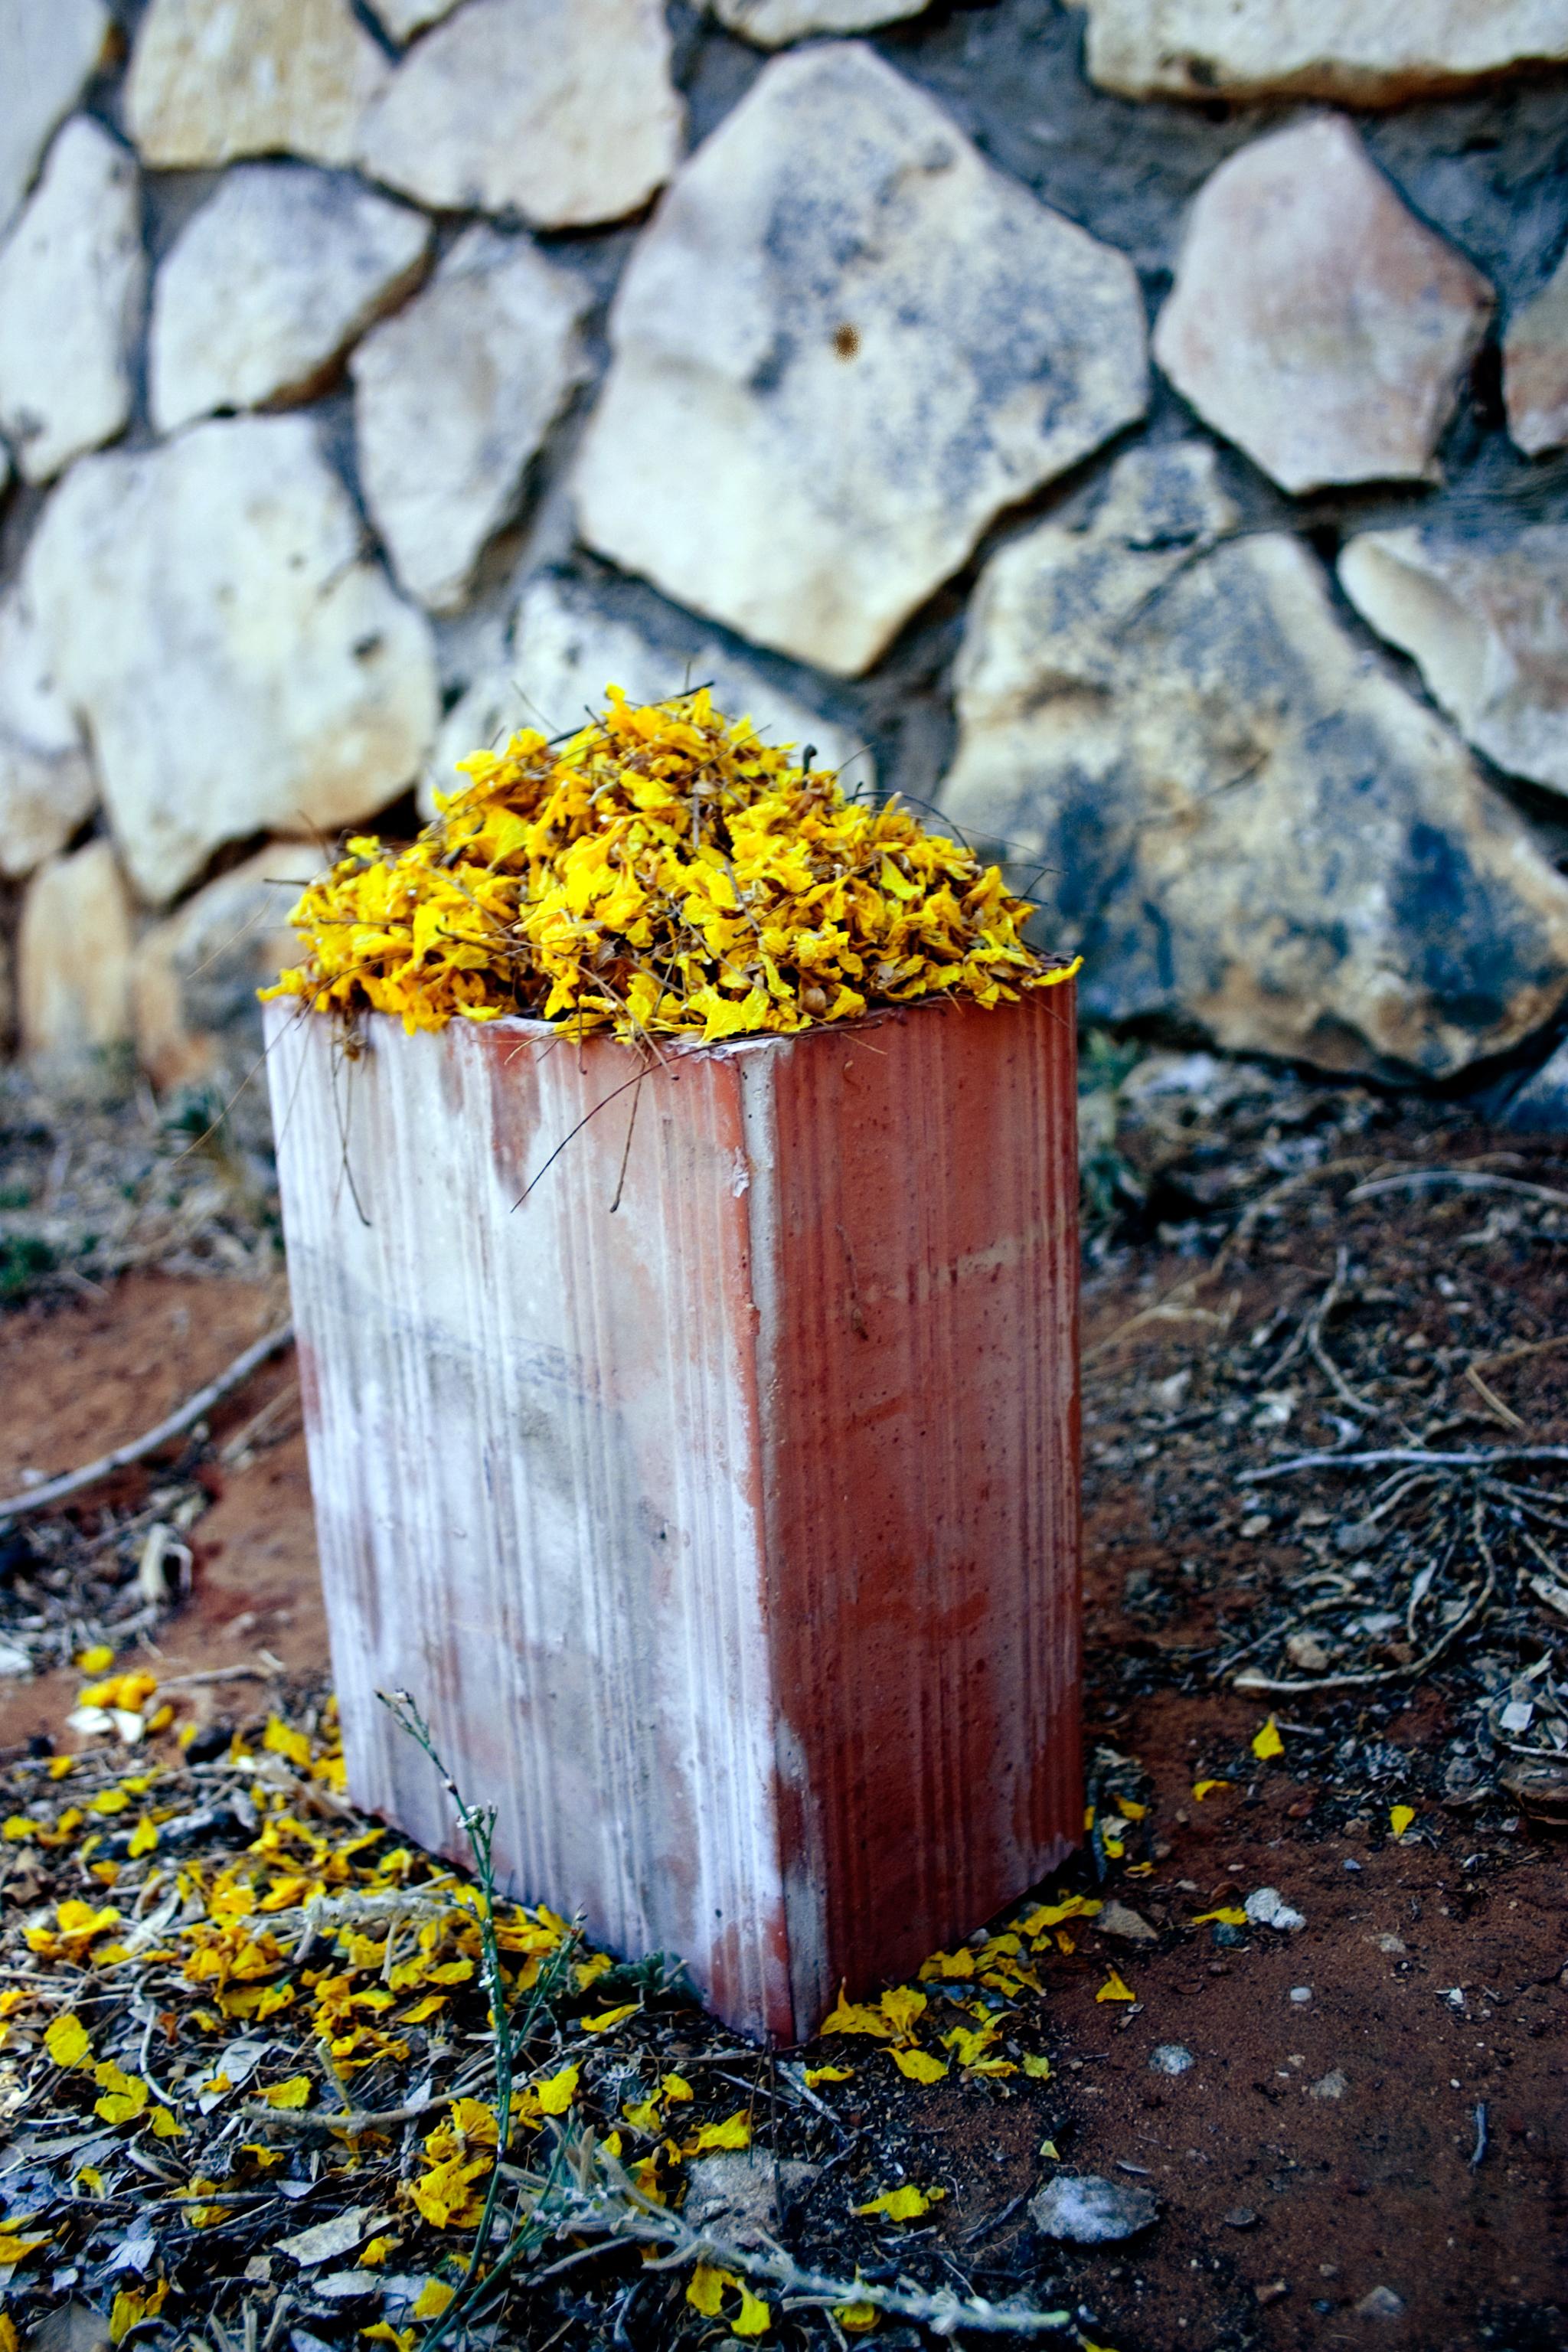 1-a.-Brick-Yellow-flower-.jpg